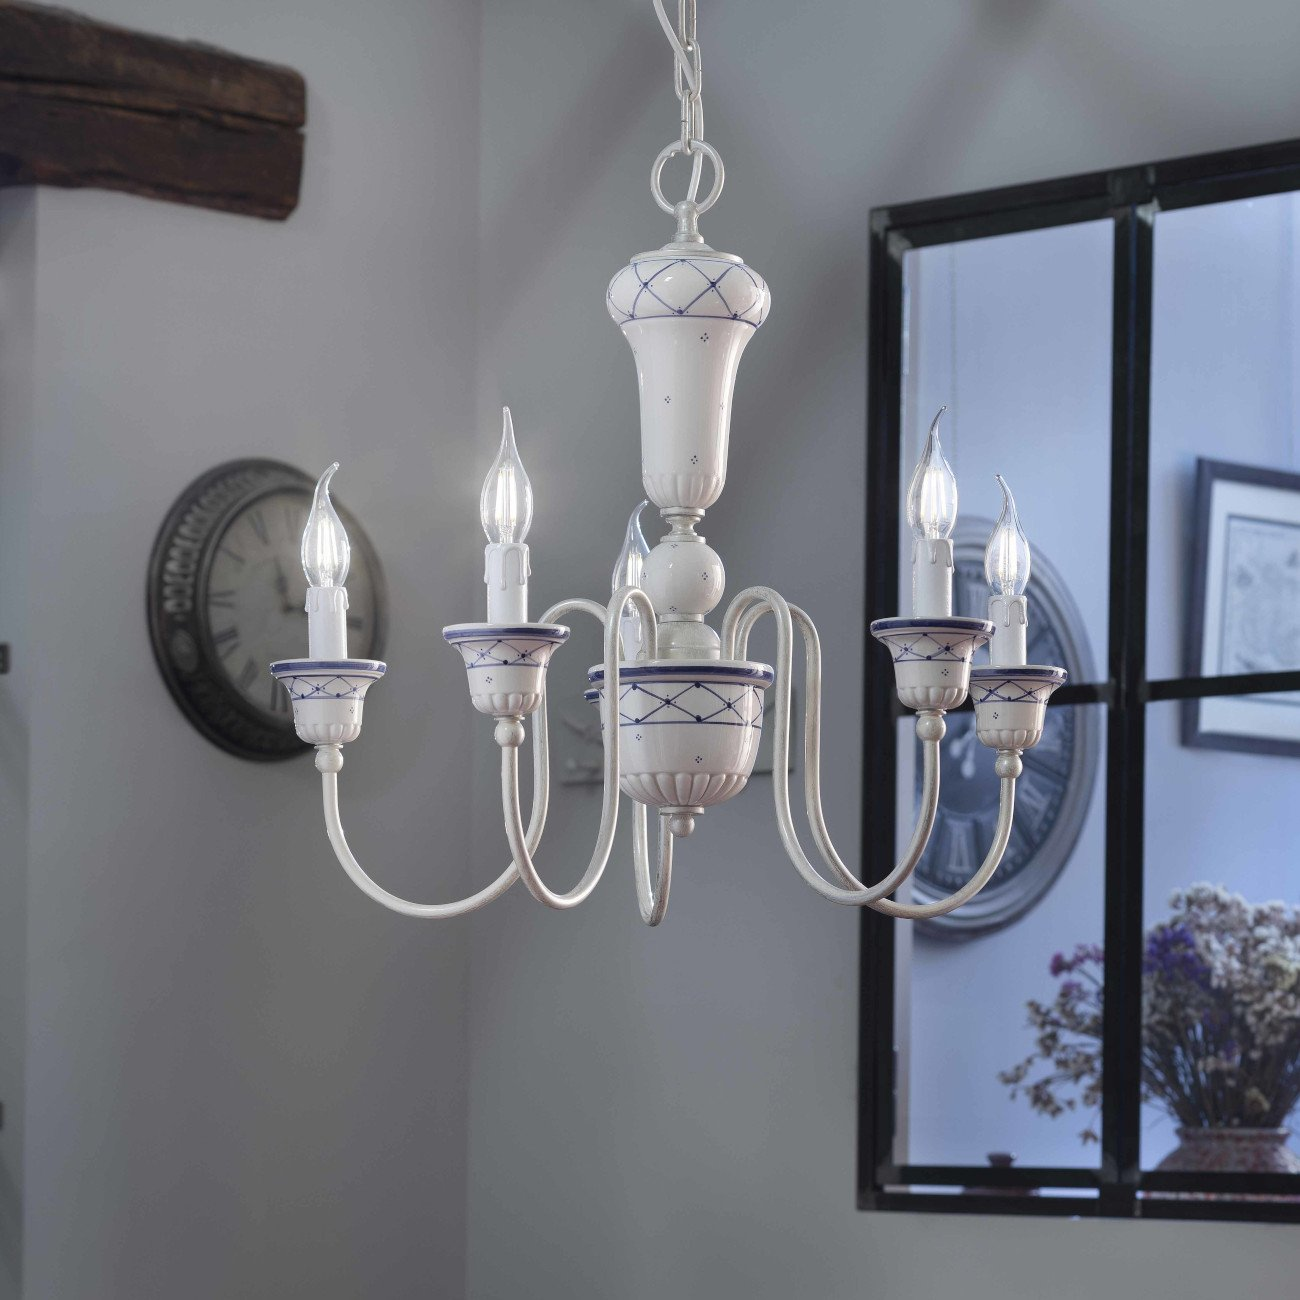 keramik messing kronleuchter im landhausstil von ferroluce g nstig bei lampen suntinger shop kaufen. Black Bedroom Furniture Sets. Home Design Ideas